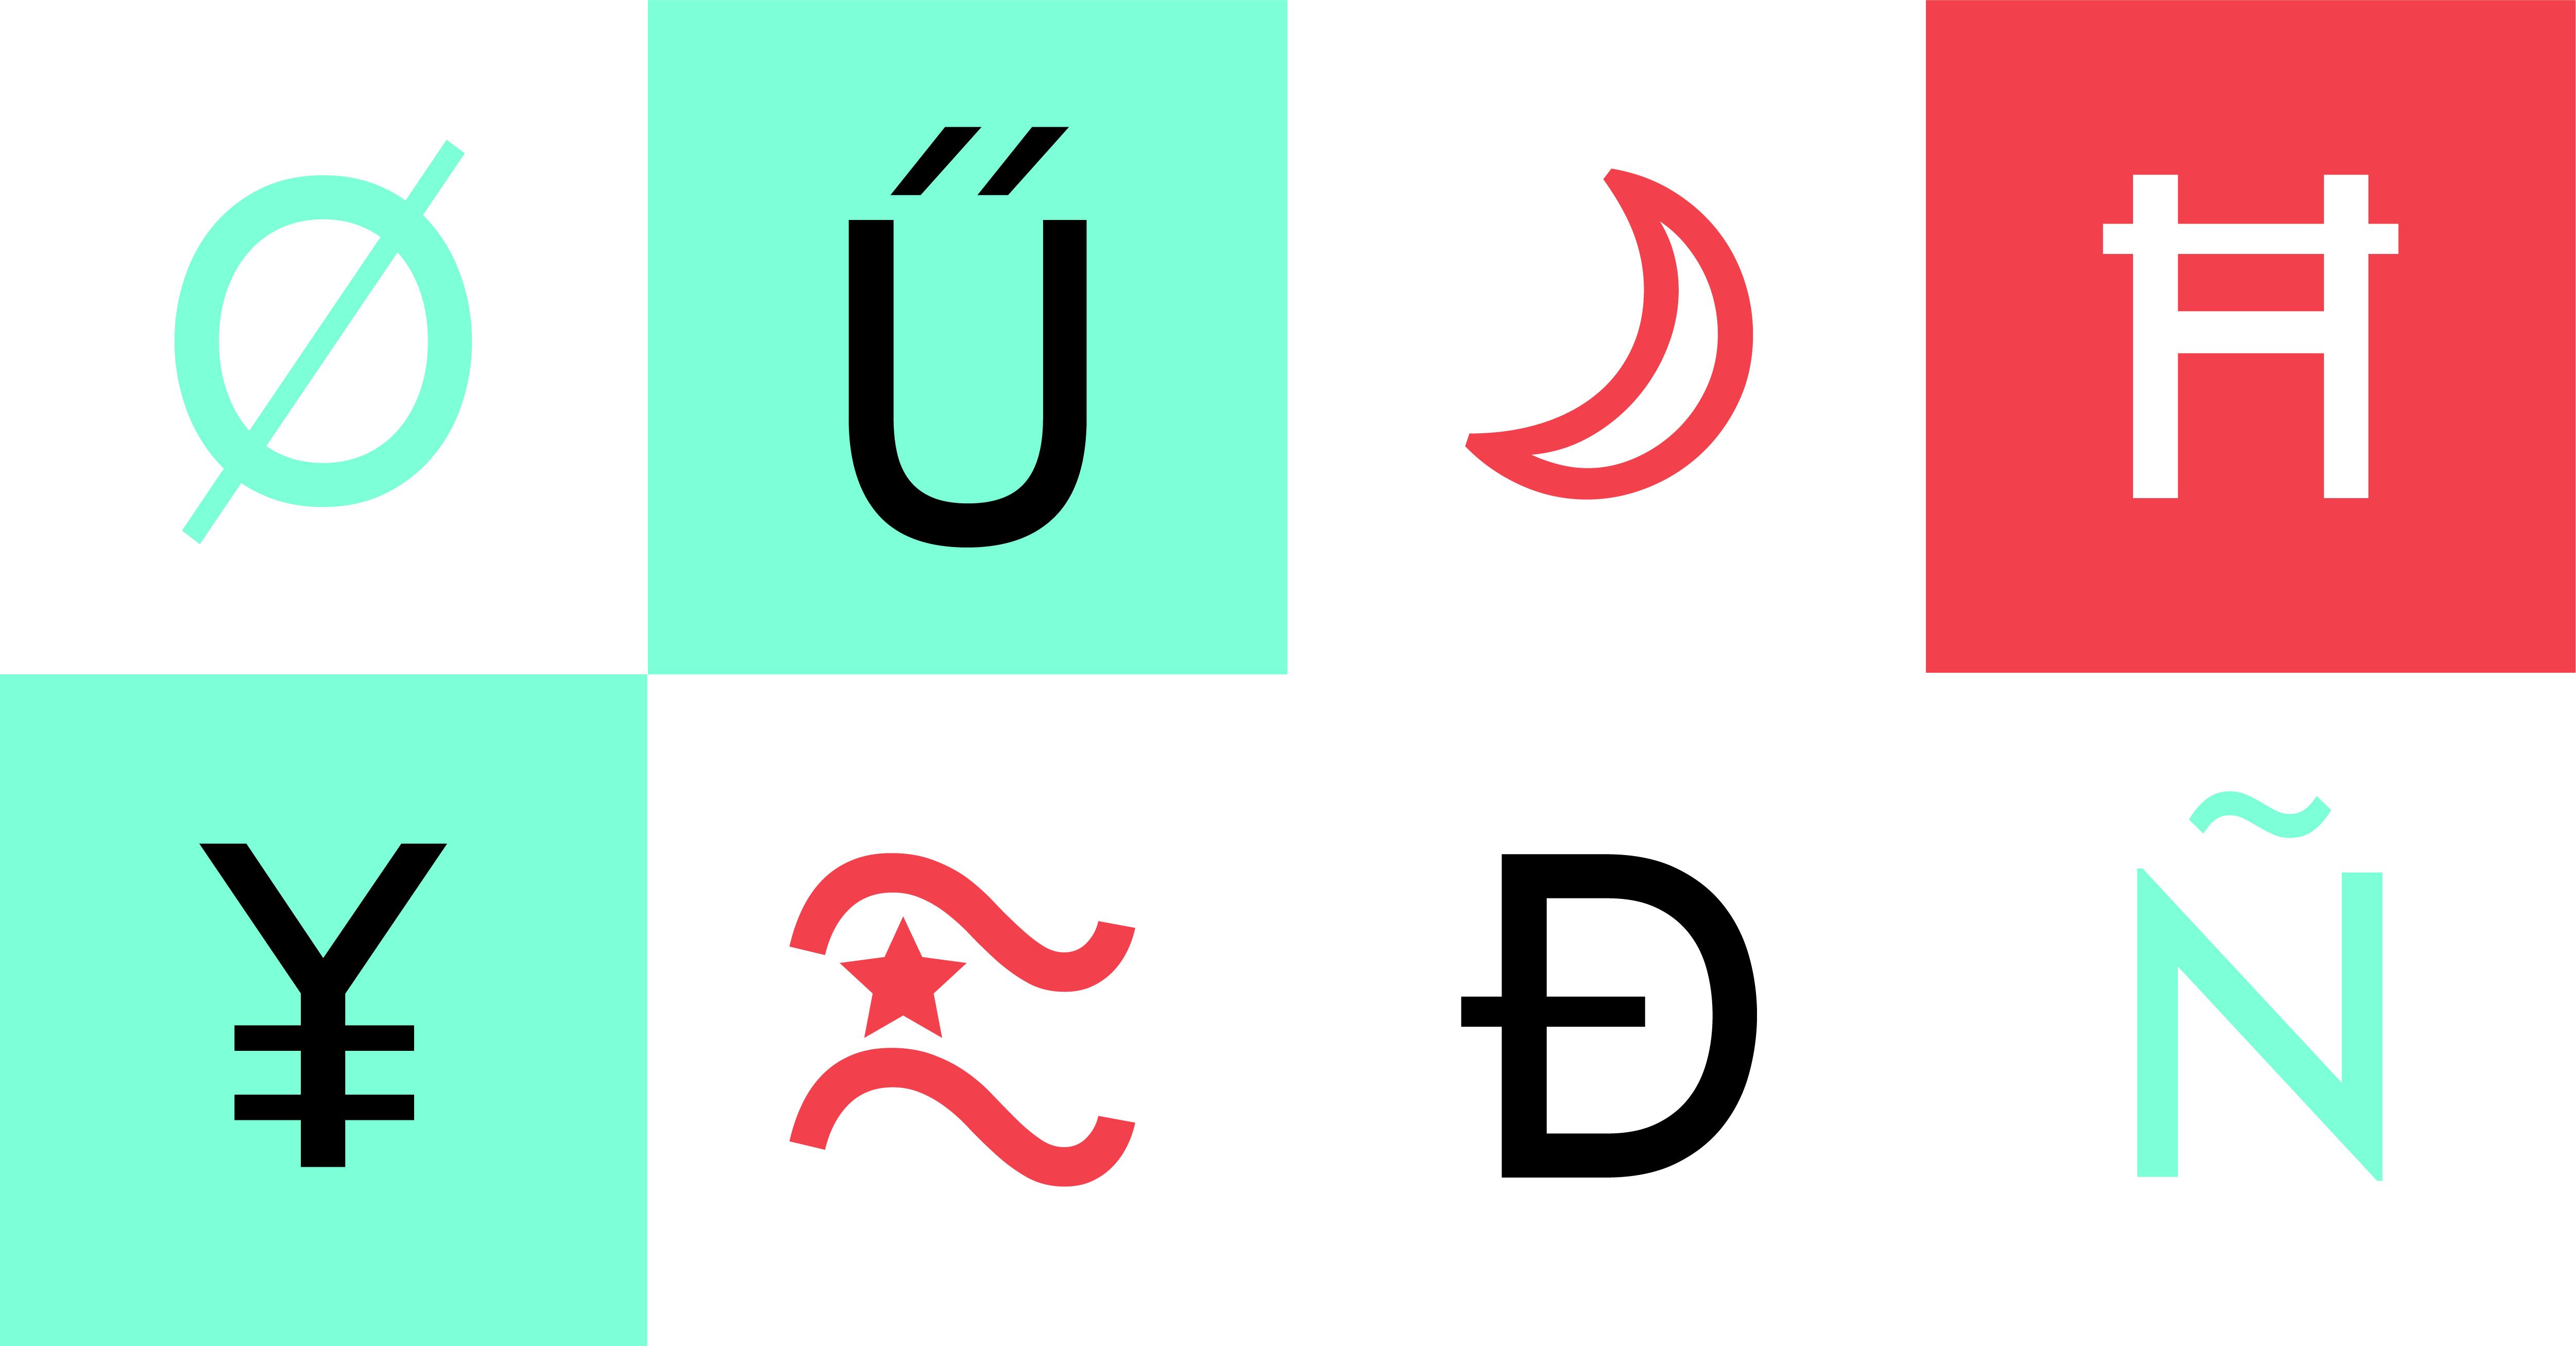 Multilingual Font Design: Languages of the World, Unite!